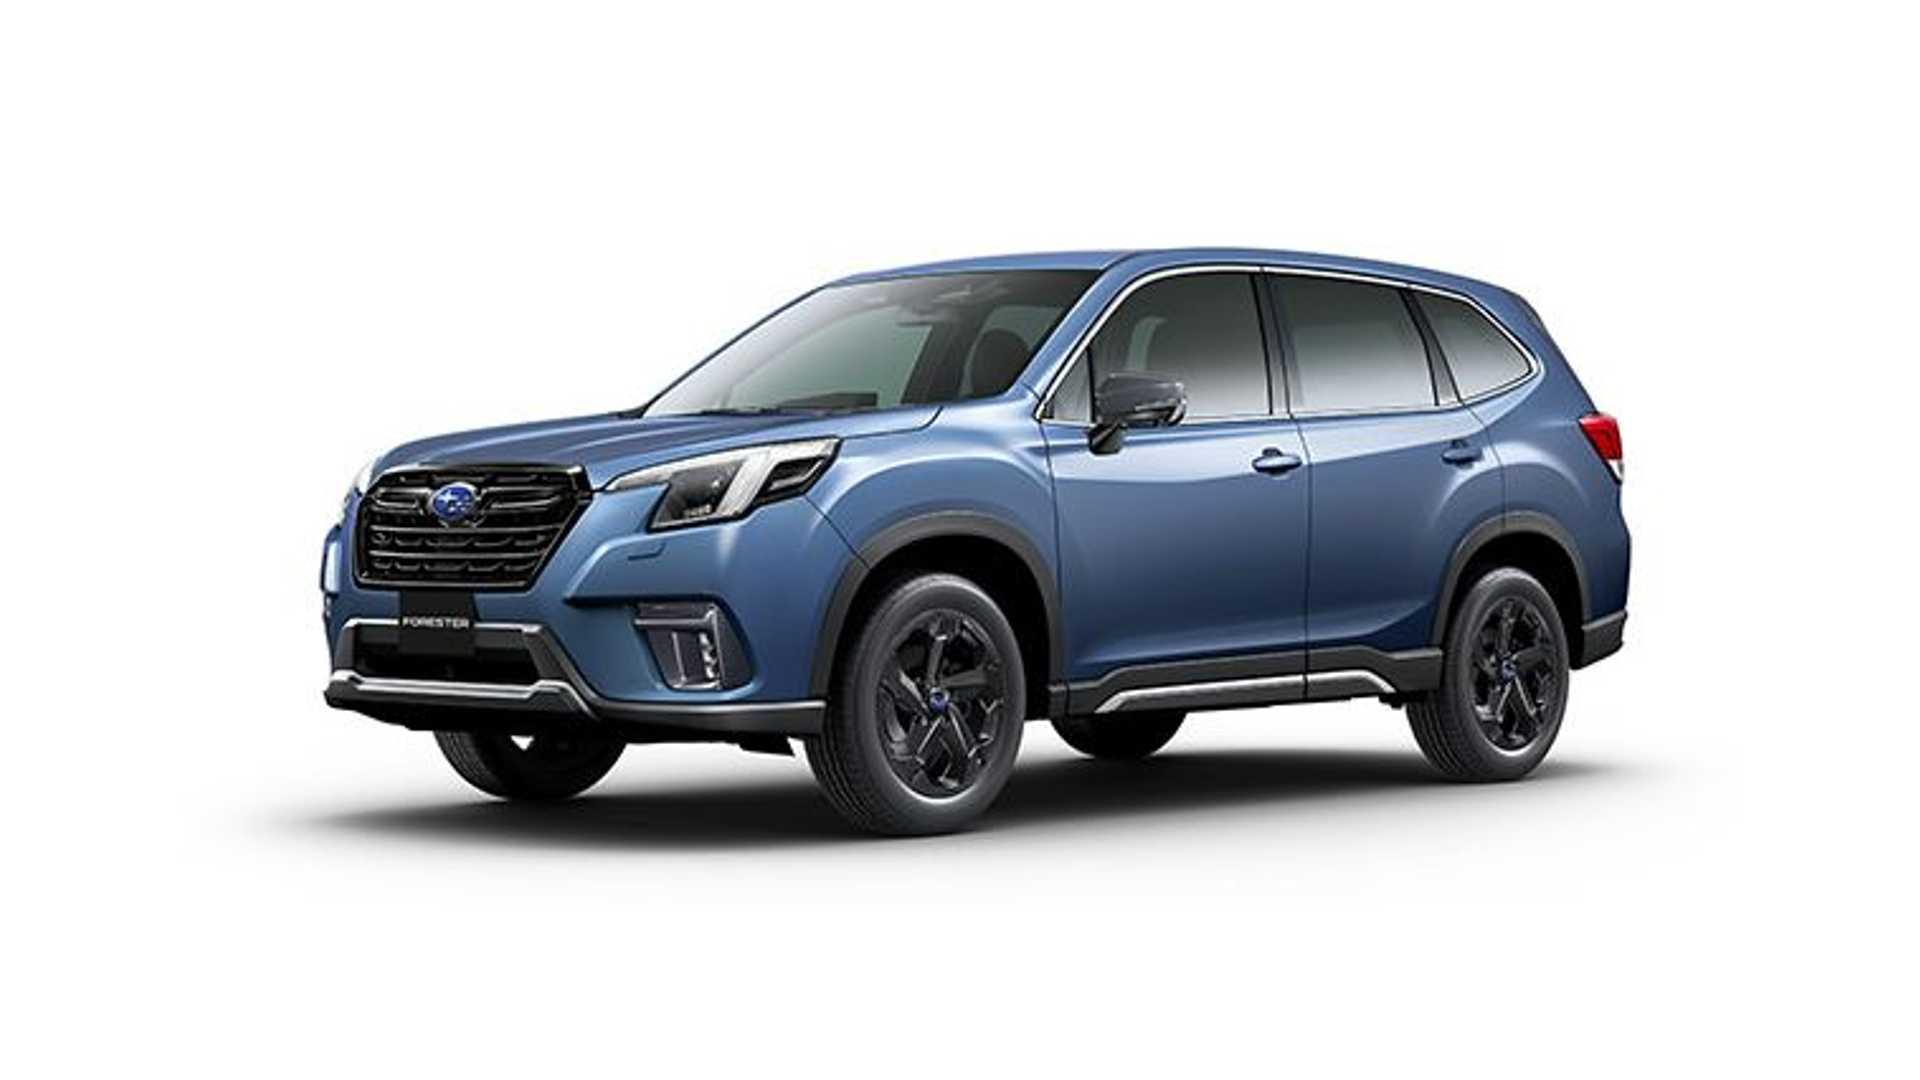 Subaru-Forester-facelift-34